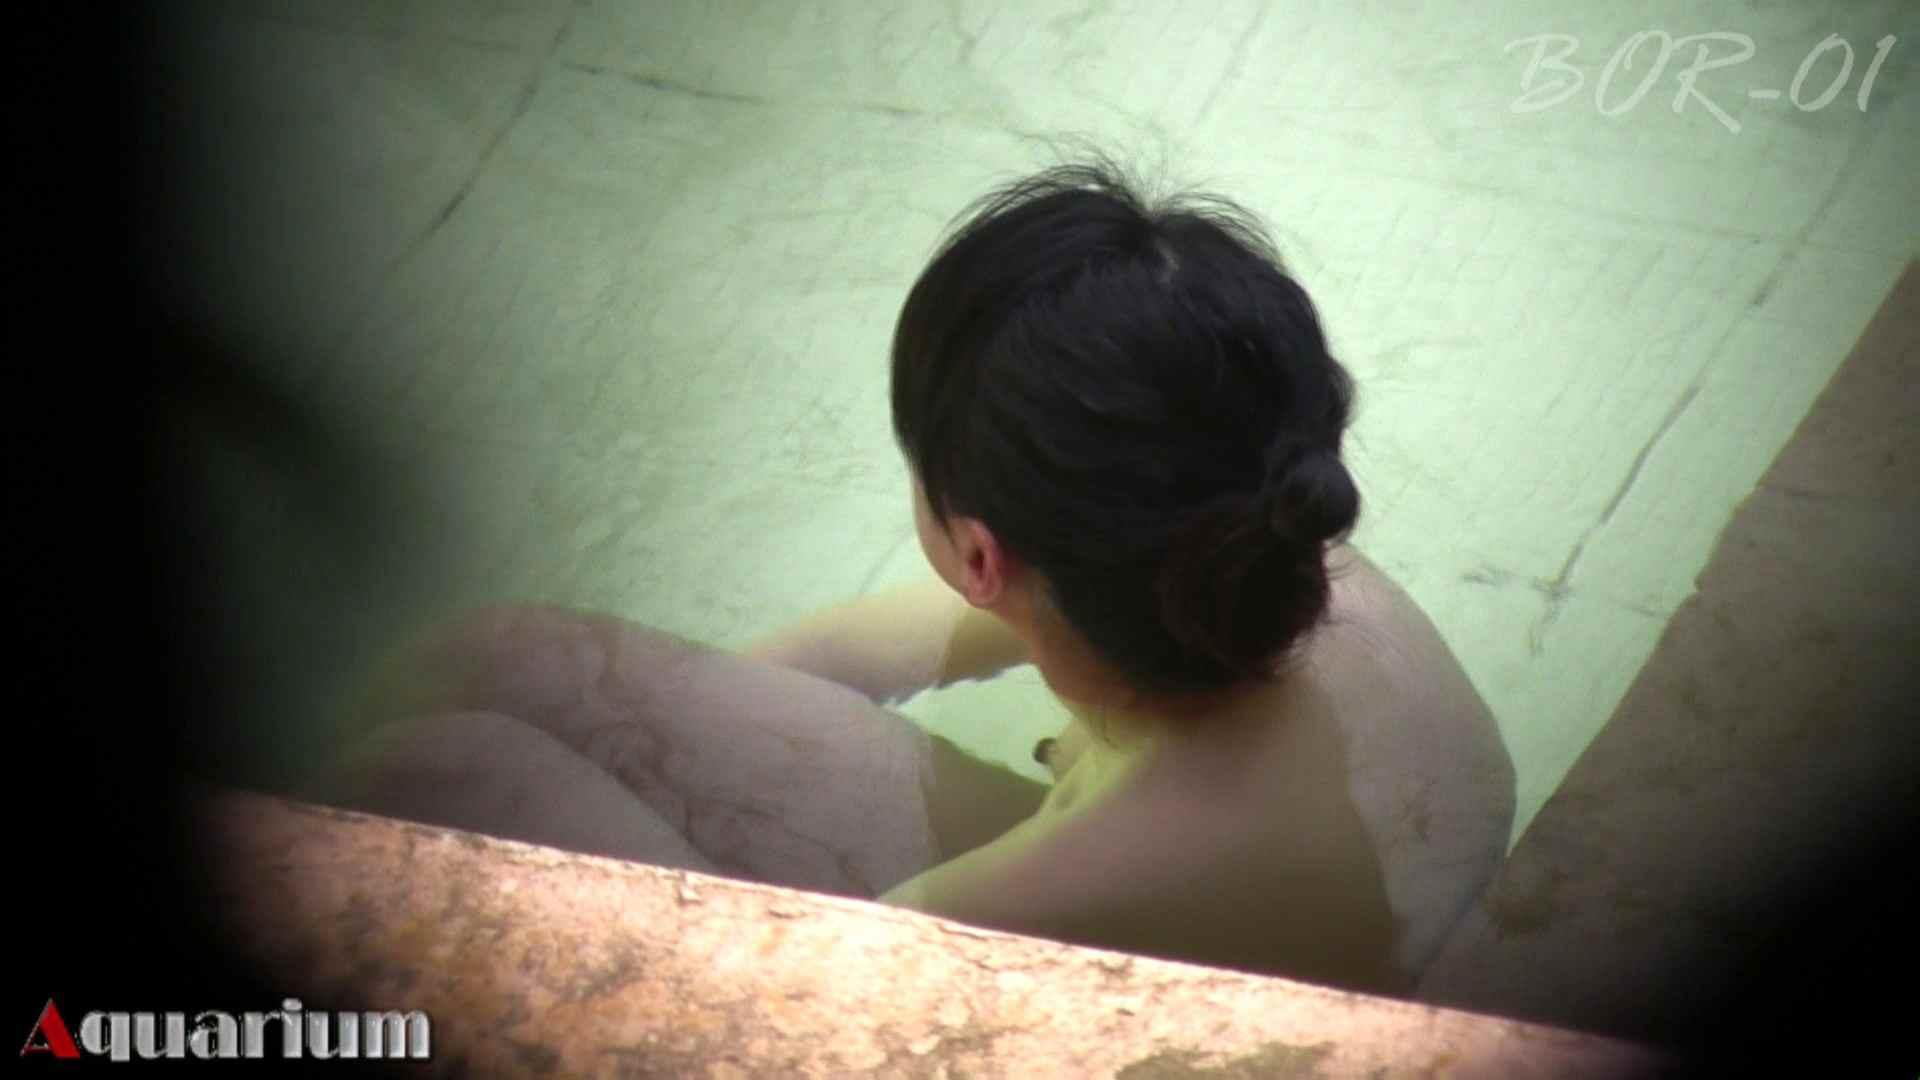 Aquaな露天風呂Vol.461 露天風呂 | OLのエロ生活  64連発 43